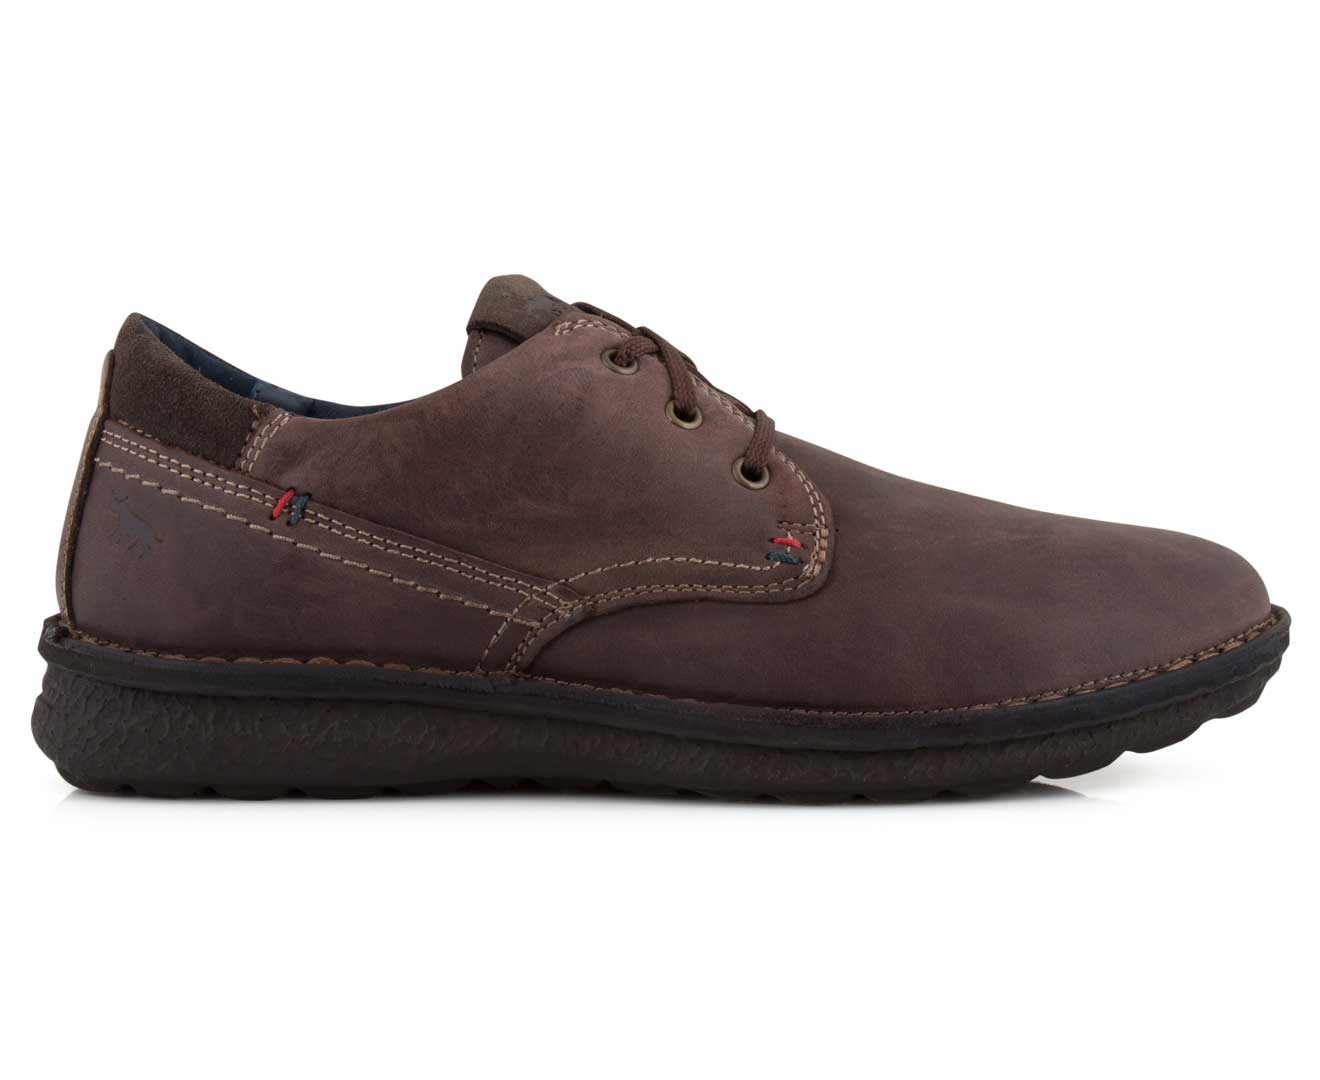 Best Mens Non Dress Dress Shoe